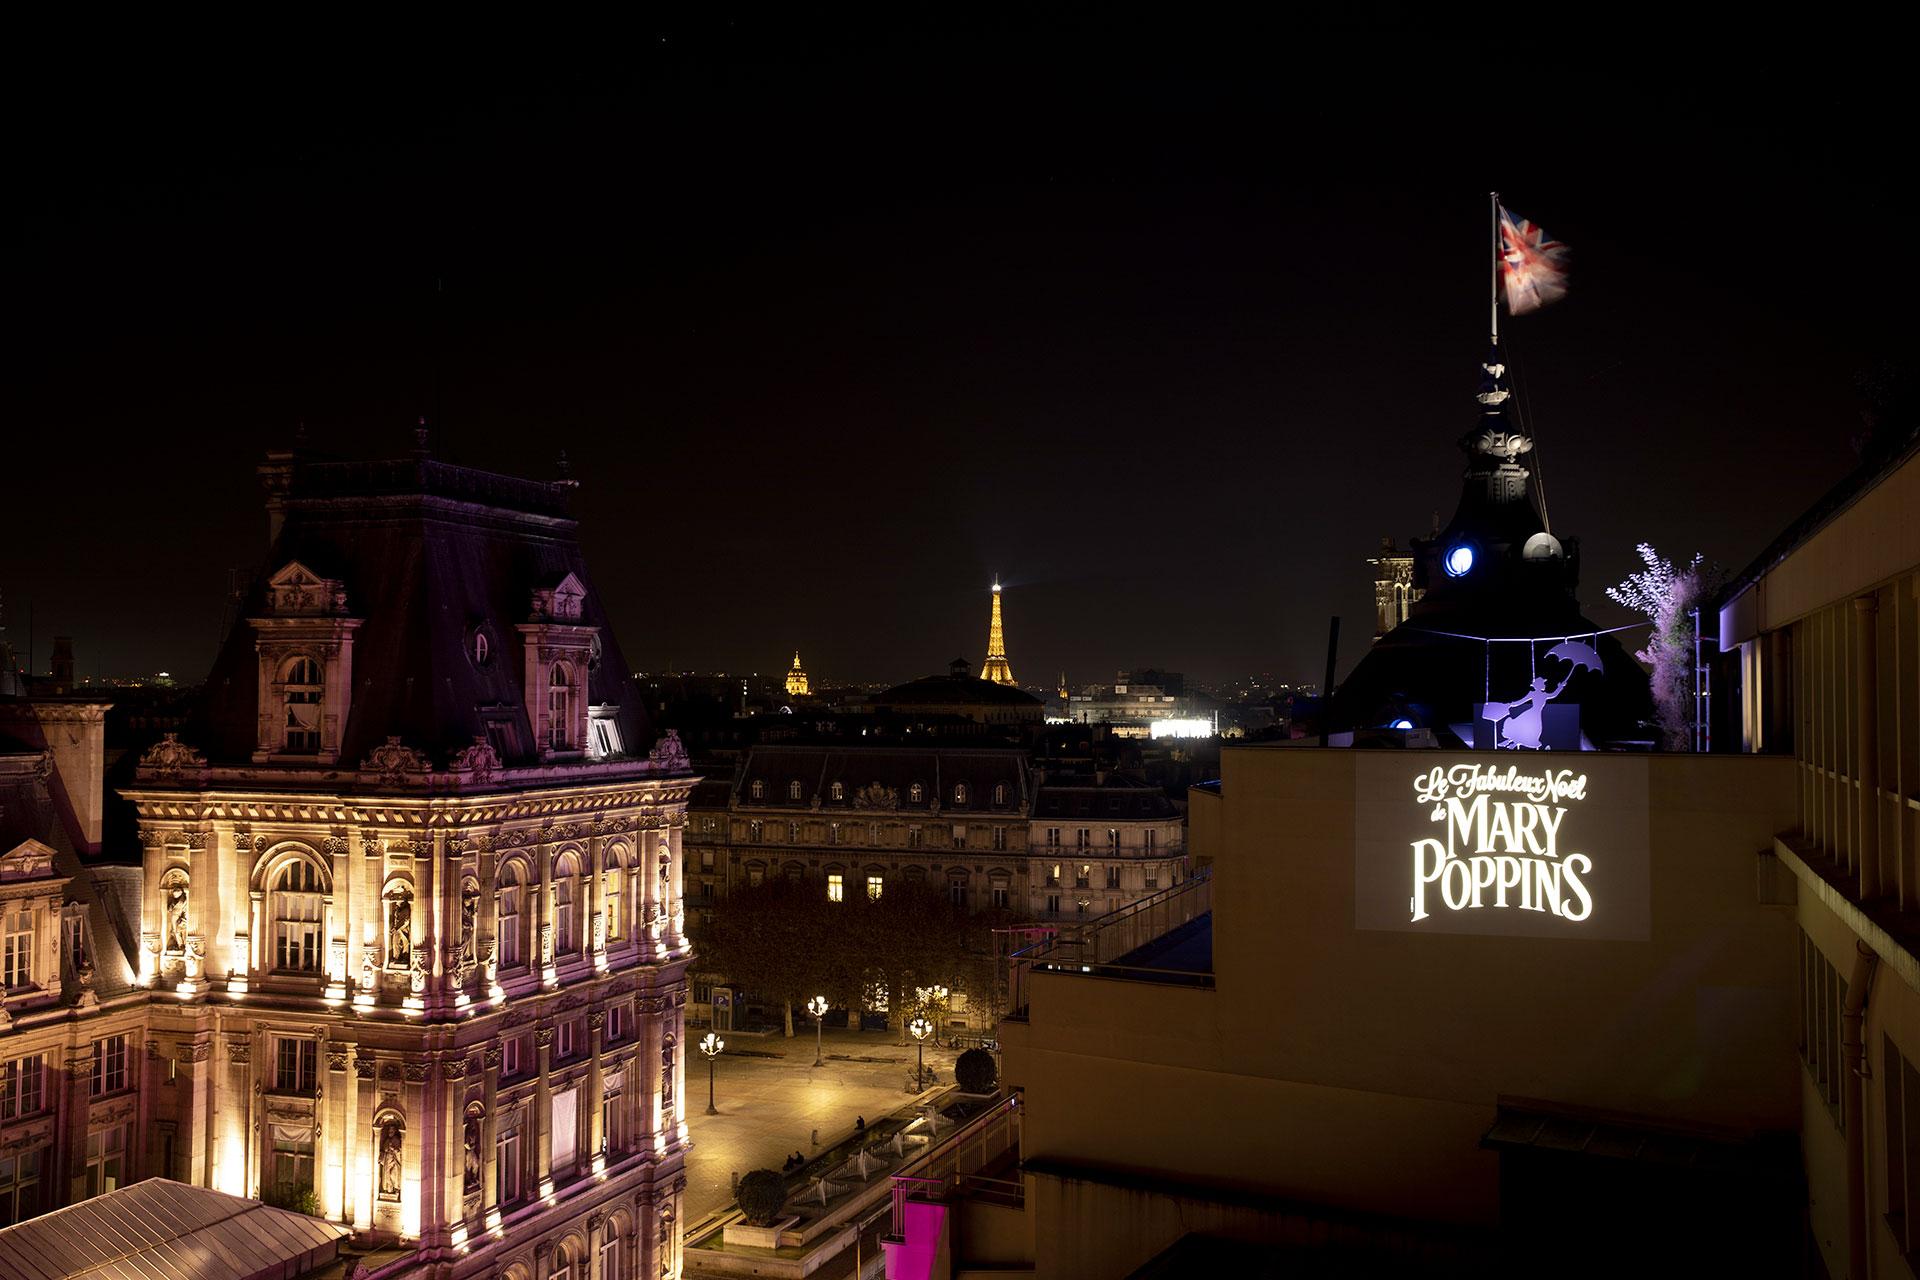 laboitedallumettes-paris-noel-illumination-ville-fetes-bhv-marais